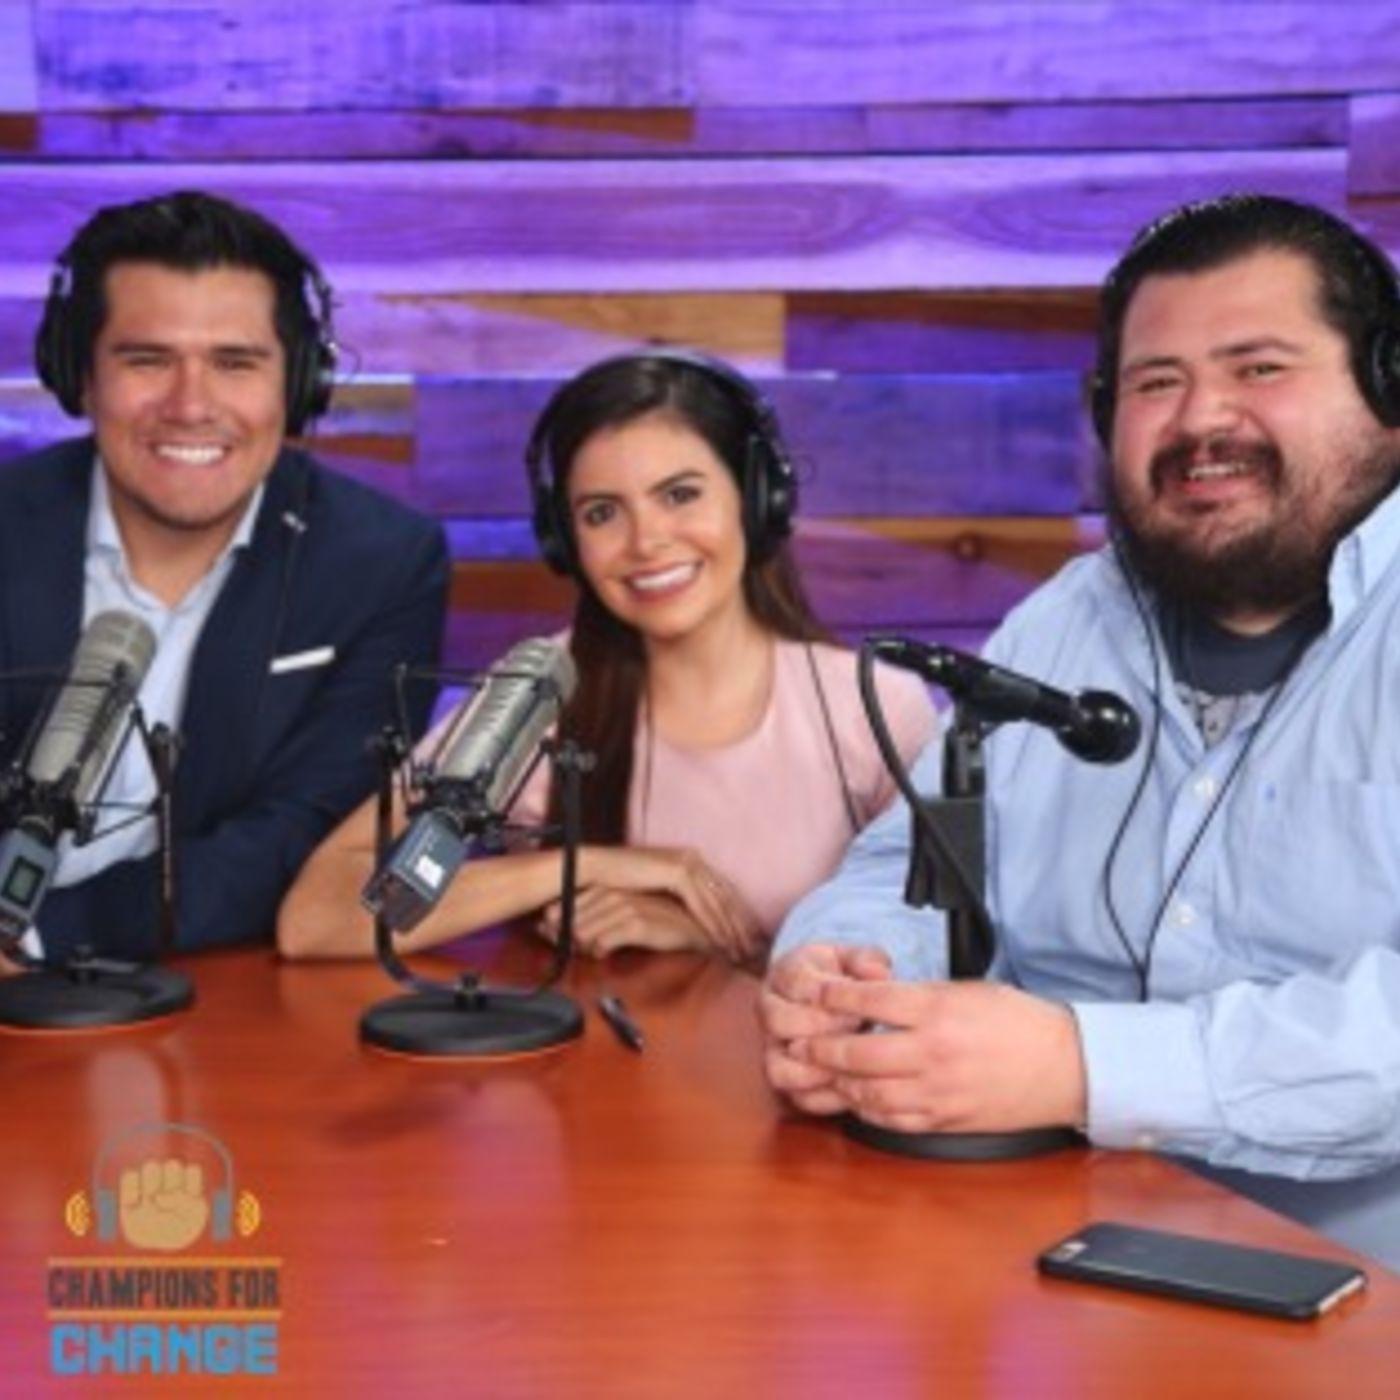 Podcast#6 - Champions for Change - Sandy Idalia Valles